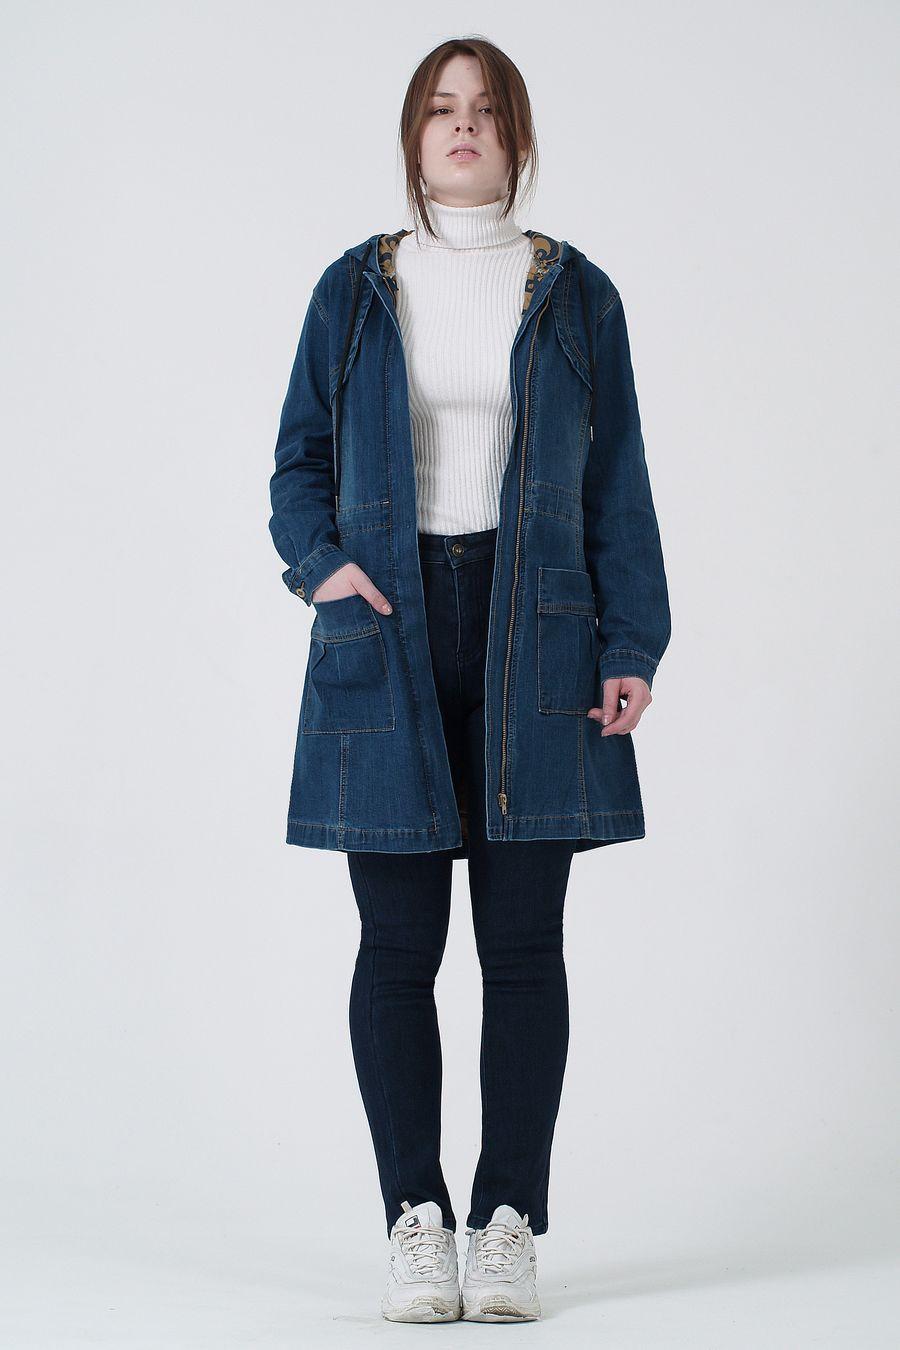 Куртка женская K.Y Jeans 901 утепленная - фото 1